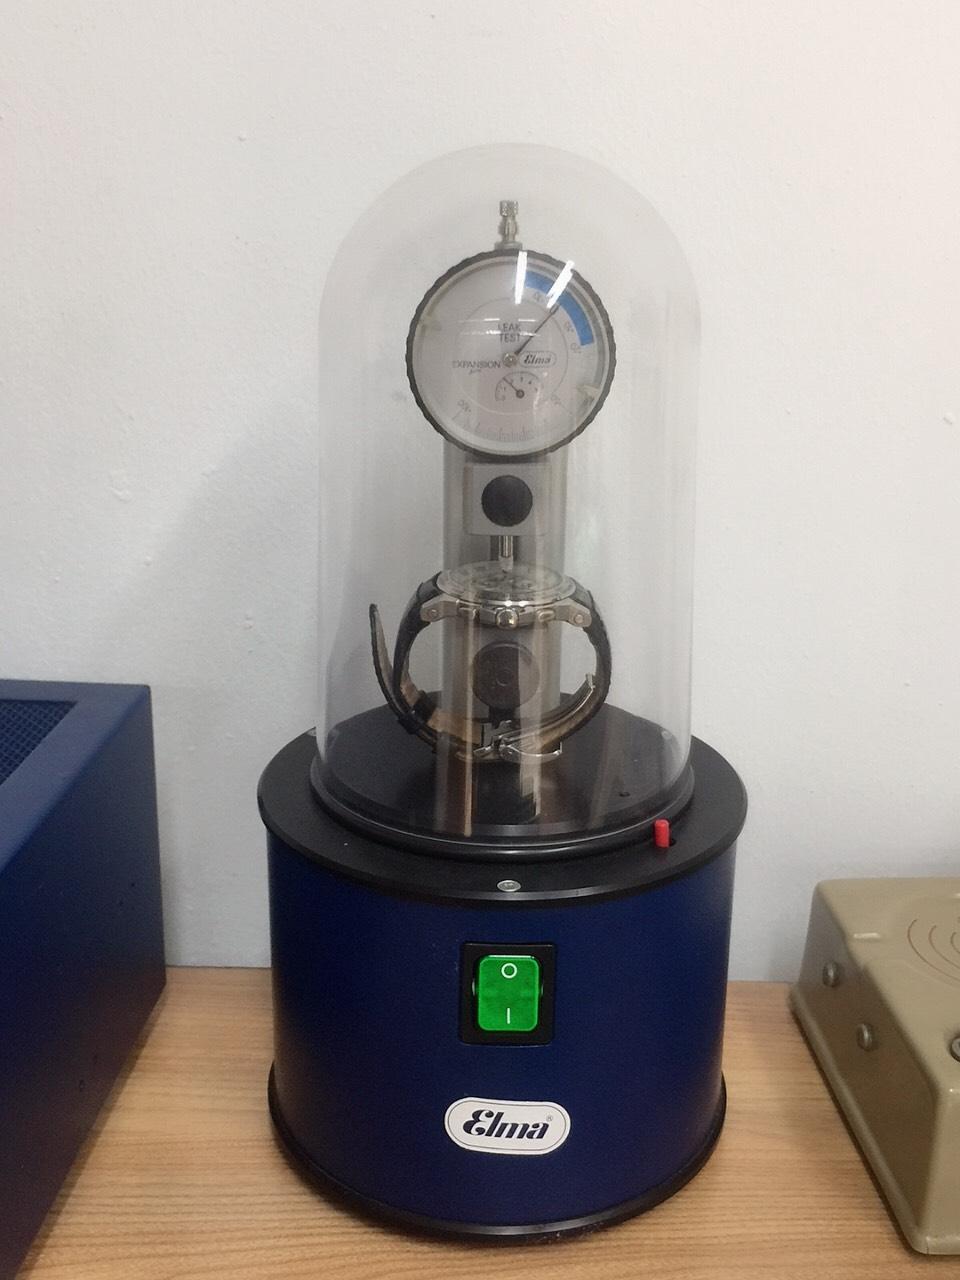 Máy thử nước đồng hồ đeo tay Elma Leak Controller 2000